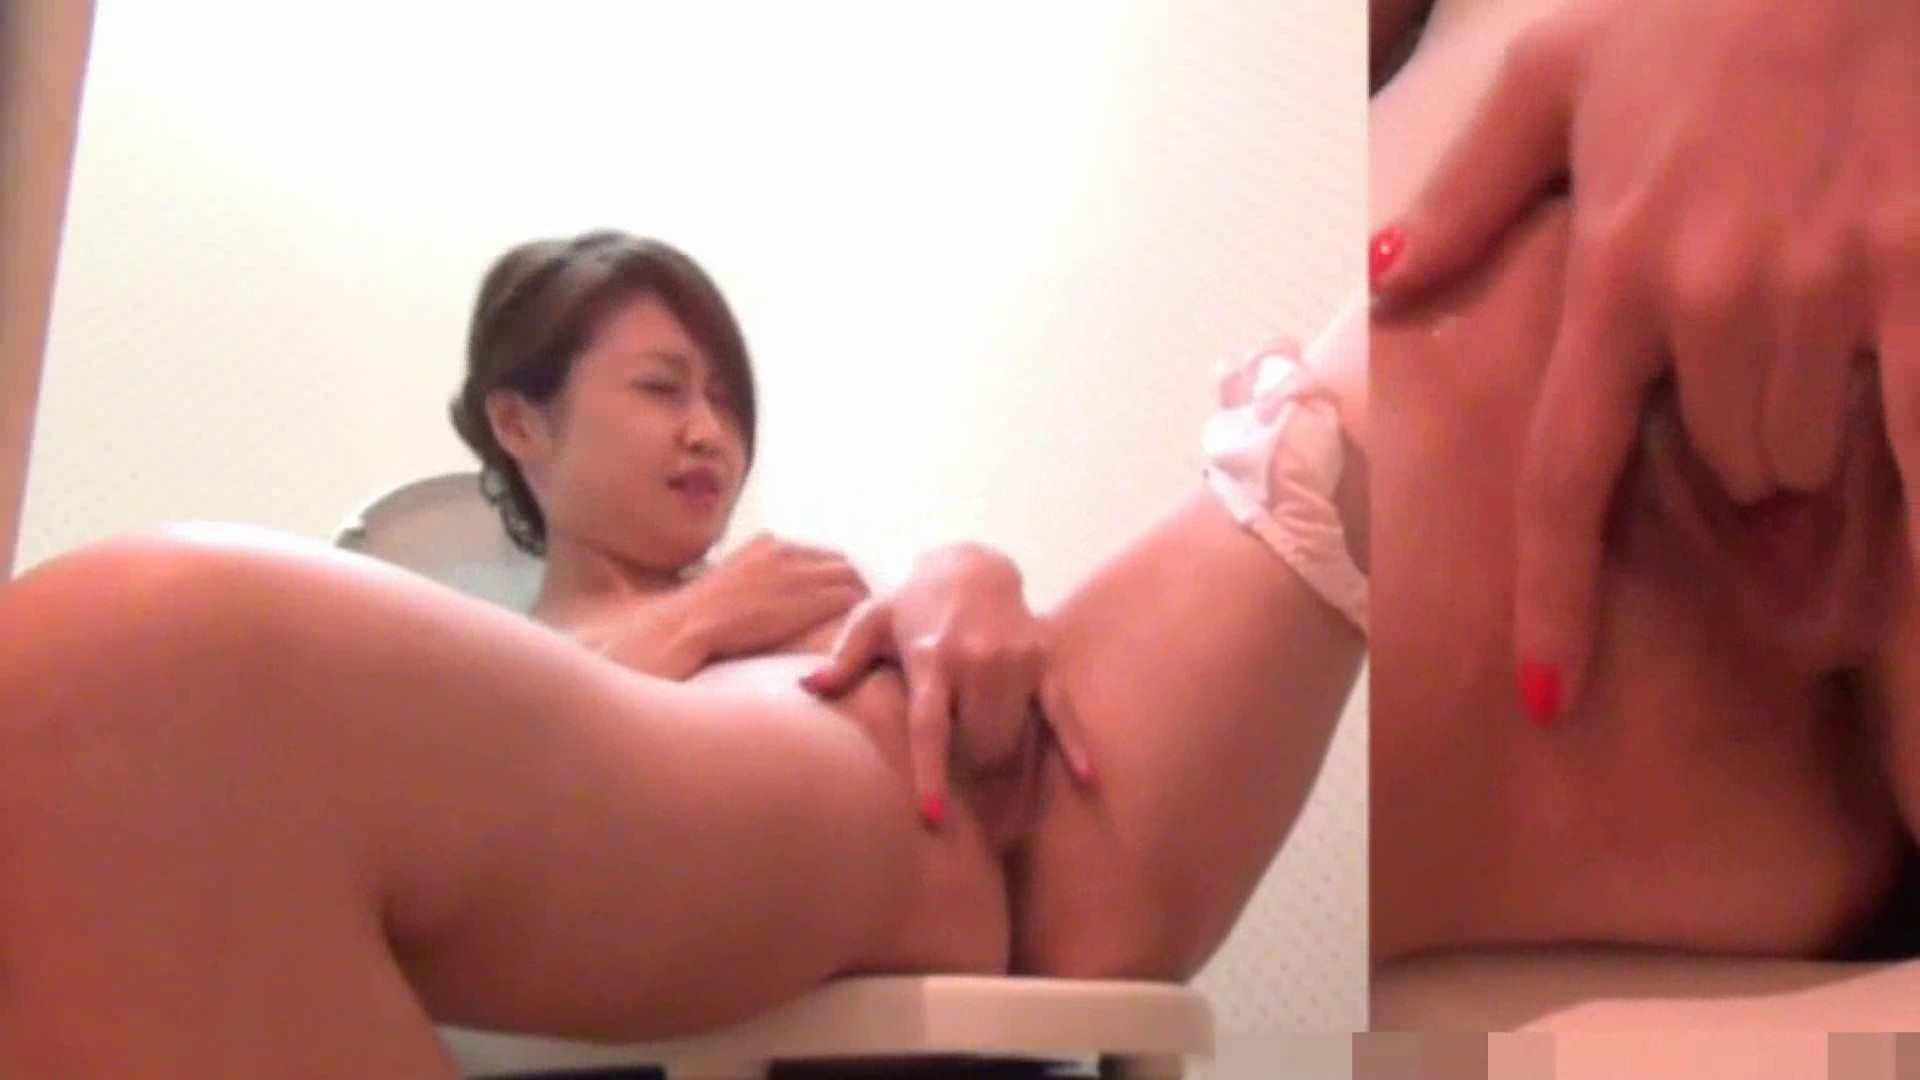 変態オナニー劇場 Vol.33 流出作品 濡れ場動画紹介 90pic 54